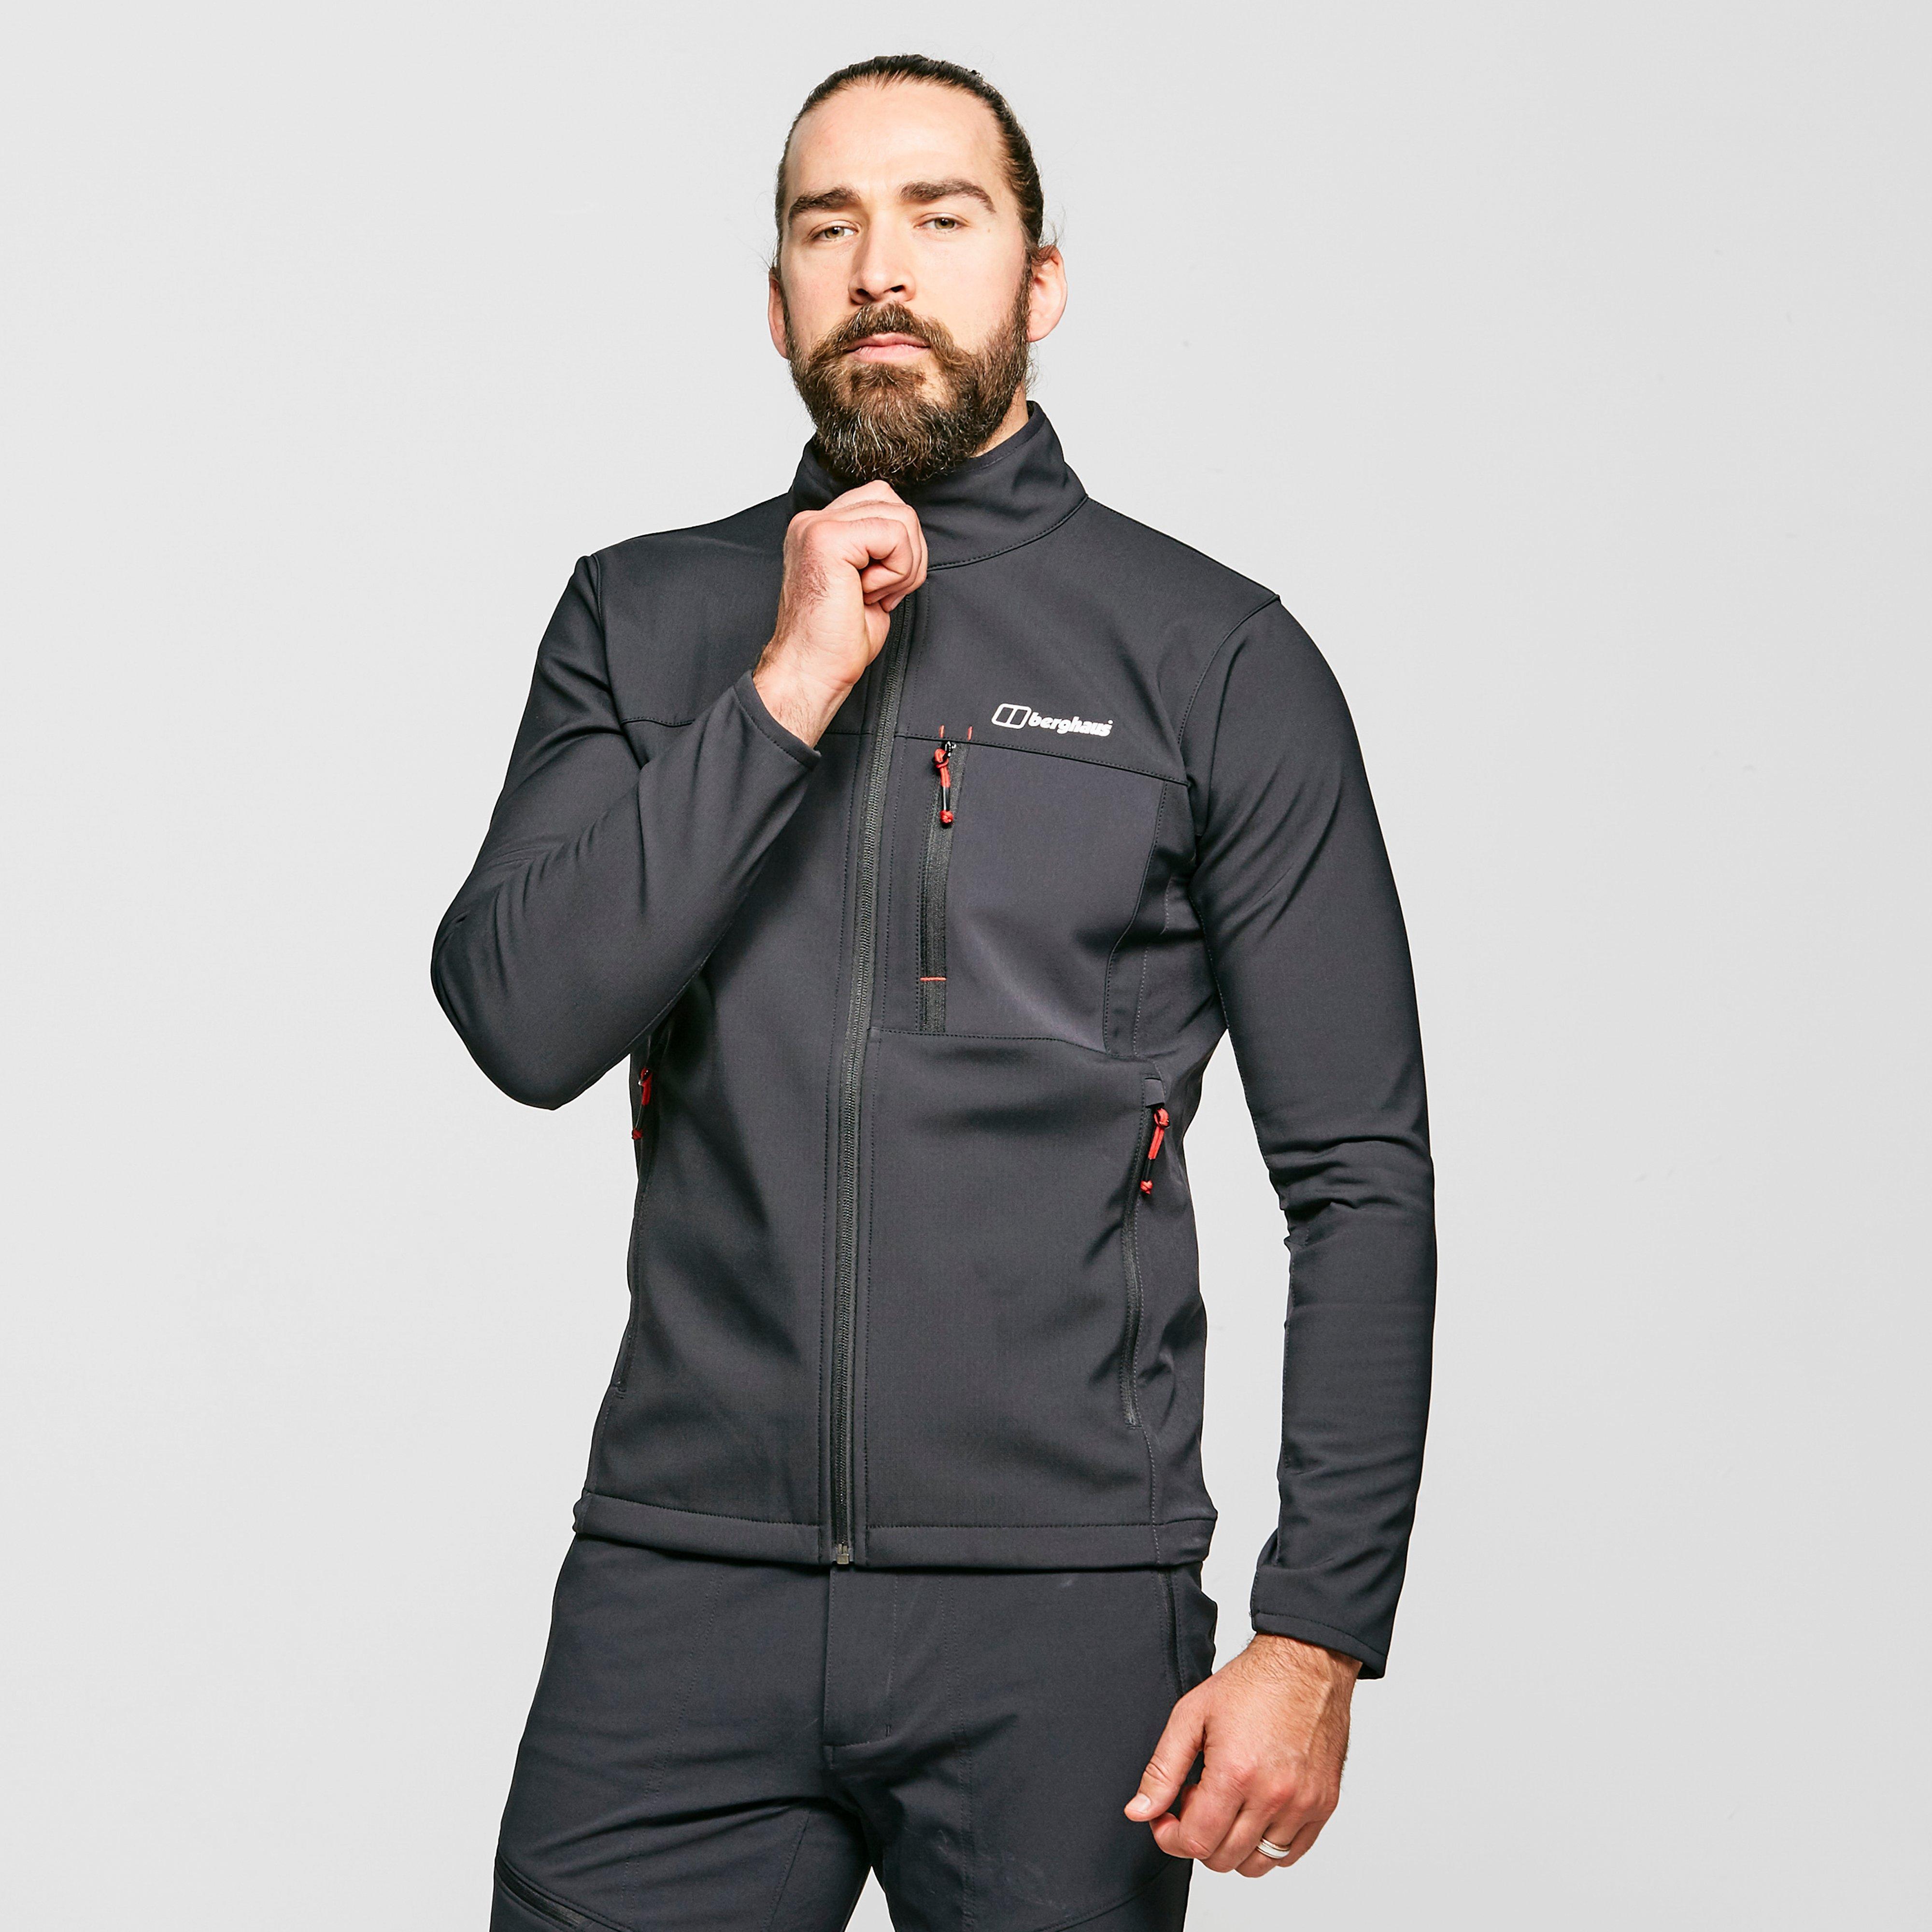 Berghaus Mens Ghlas 2.0 Softshell Jacket - Black/blk  Black/blk